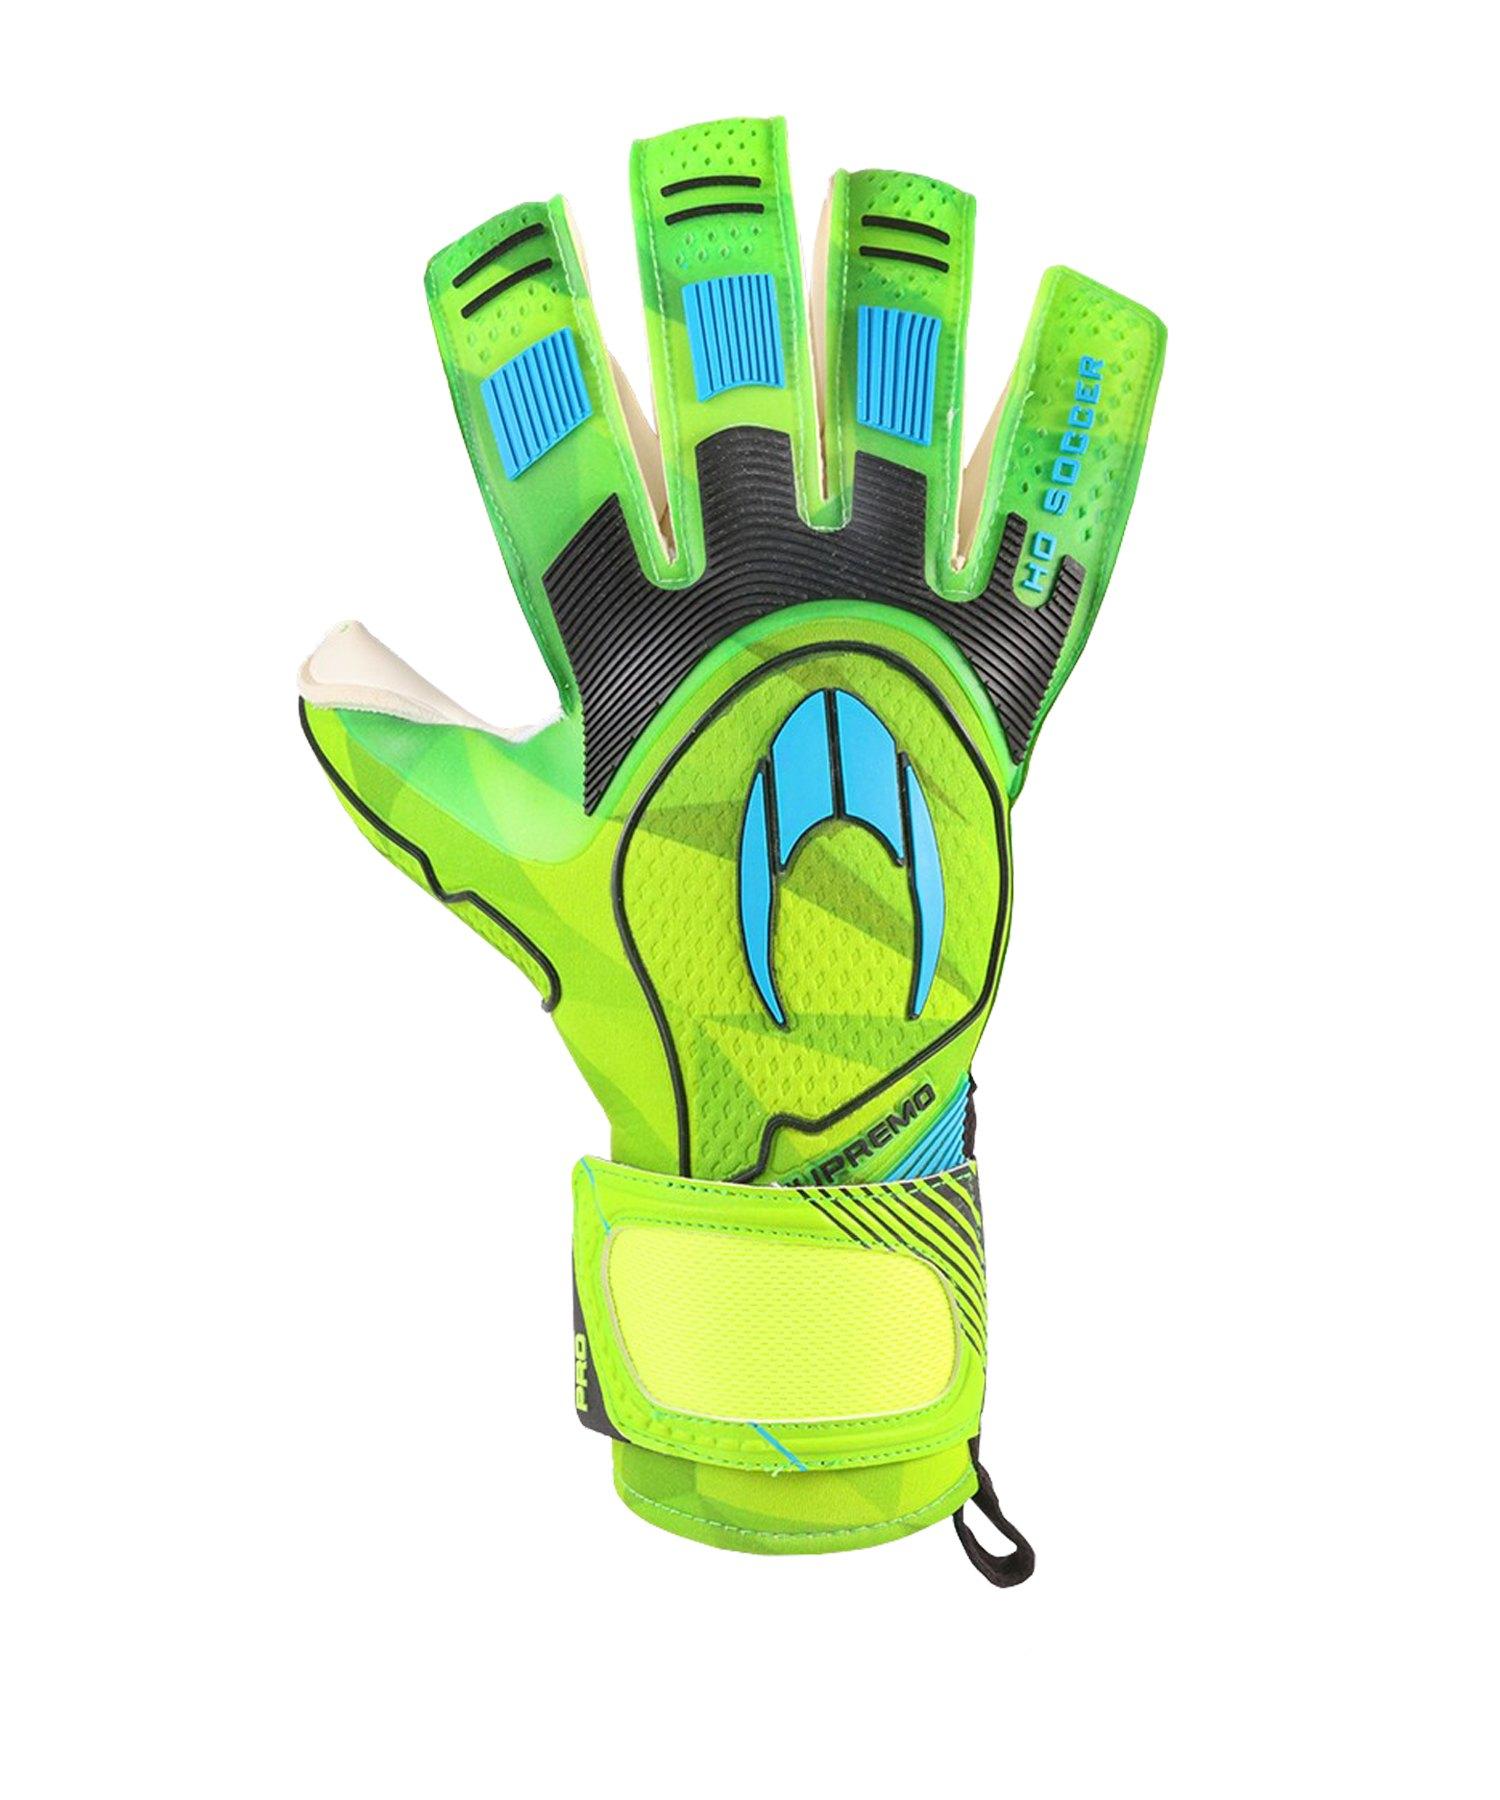 HO Soccer Supremo Pro 2 Roll TW-Handschuhe Grün - gruen